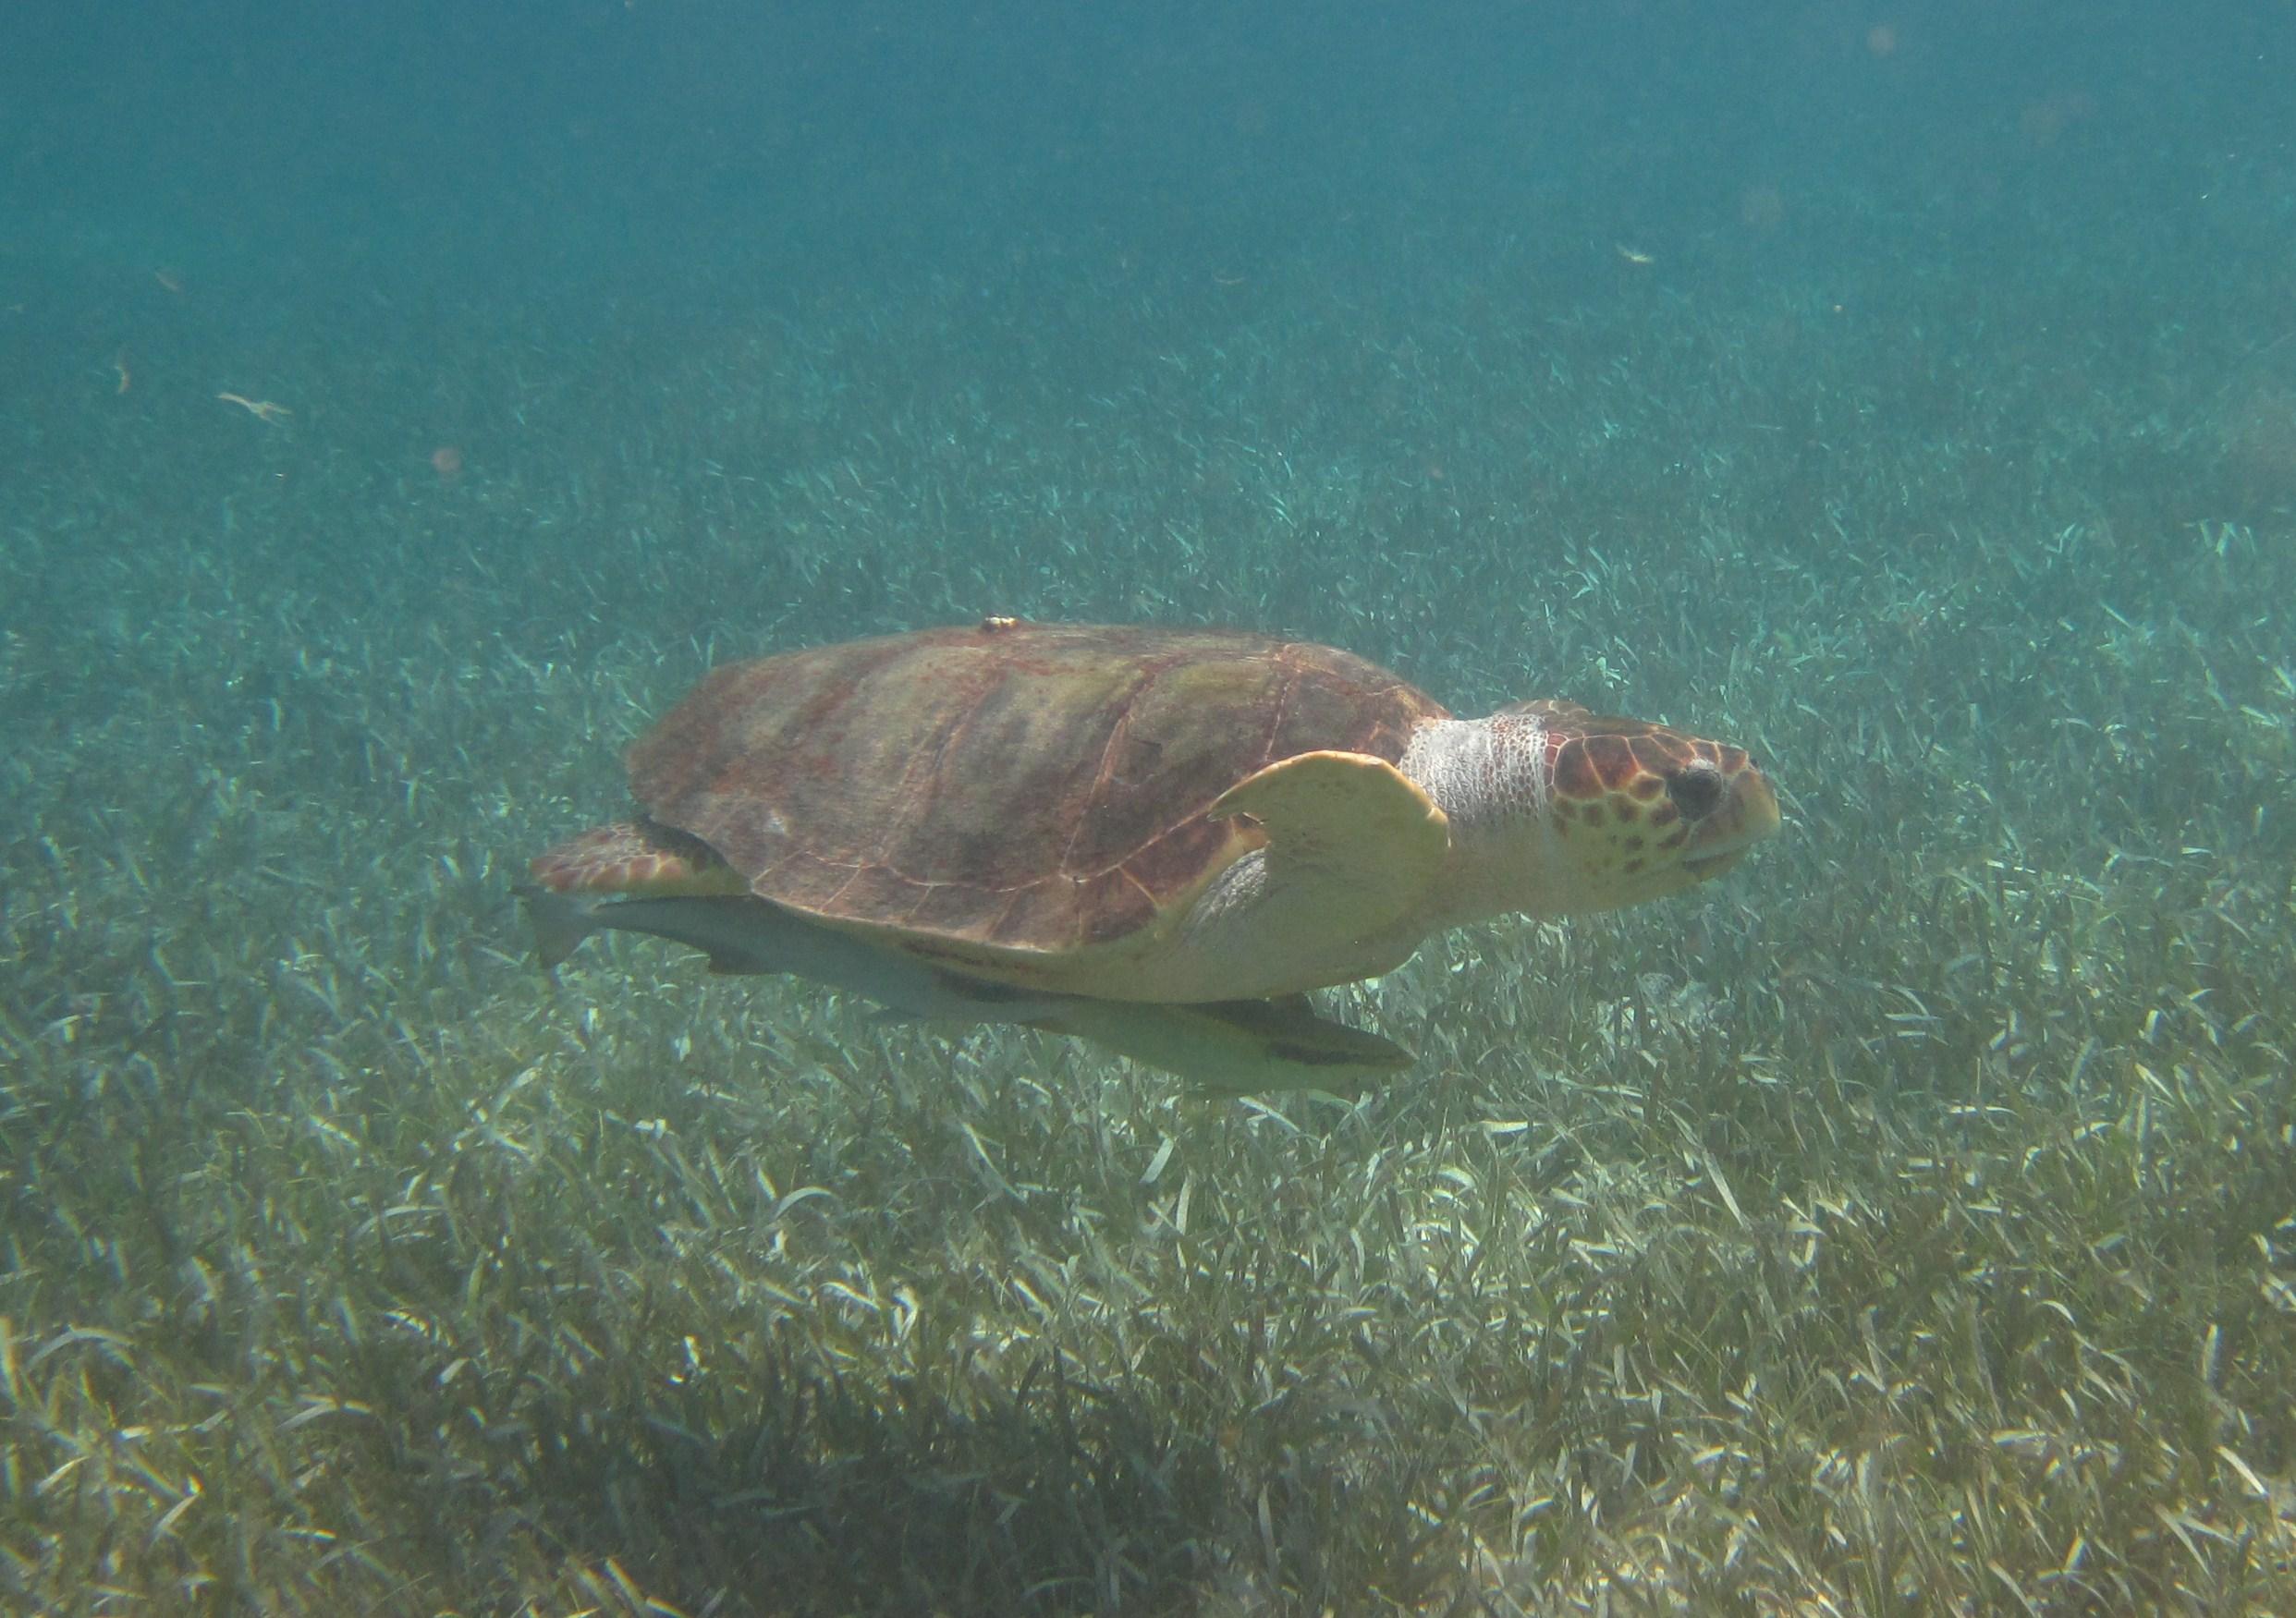 POTD: Loggerhead Turtle, Belize myd.as/p6146